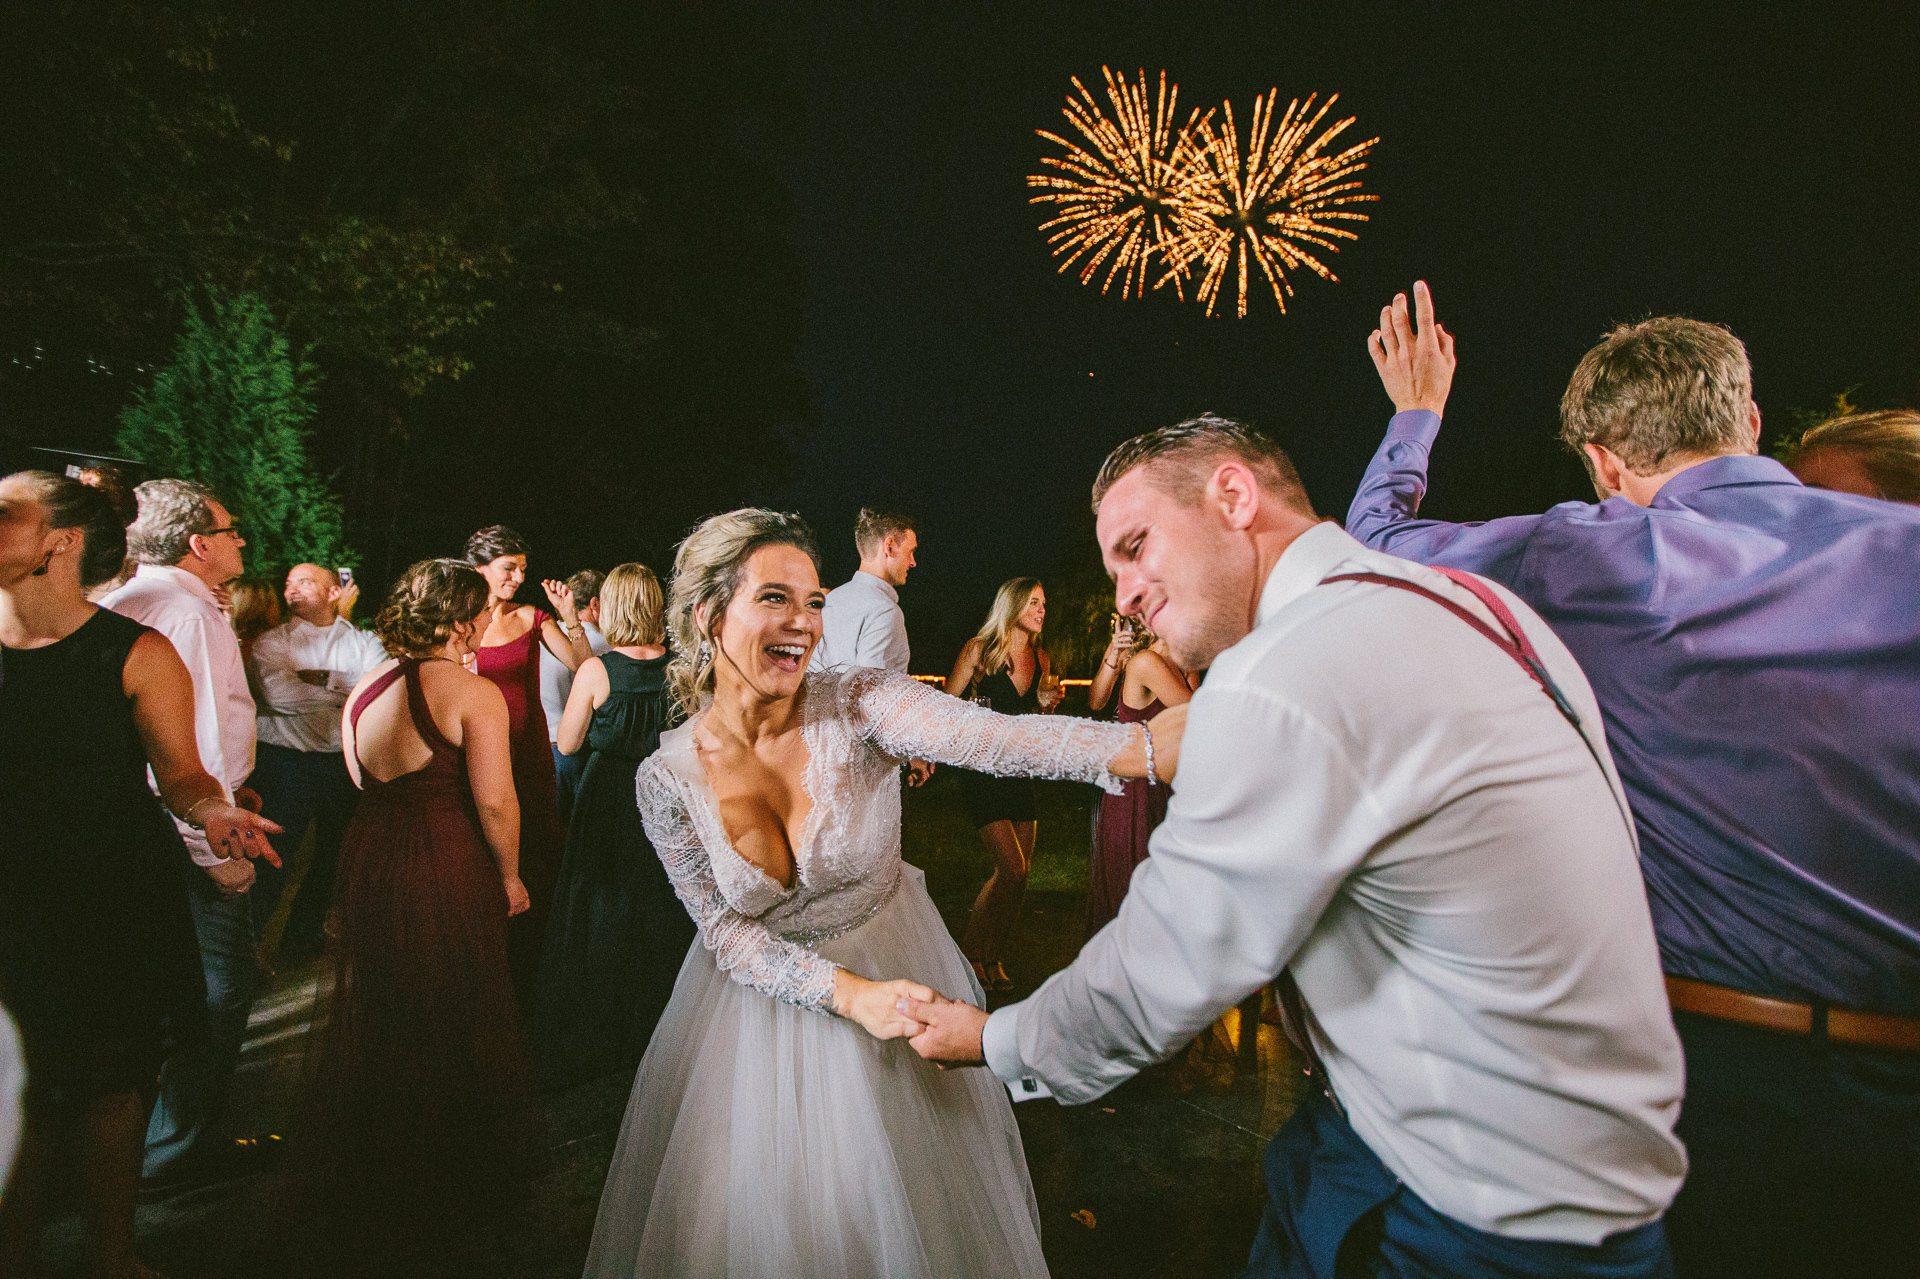 Meadow Ridge Farm Wedding Photos in Windsor 3 32.jpg